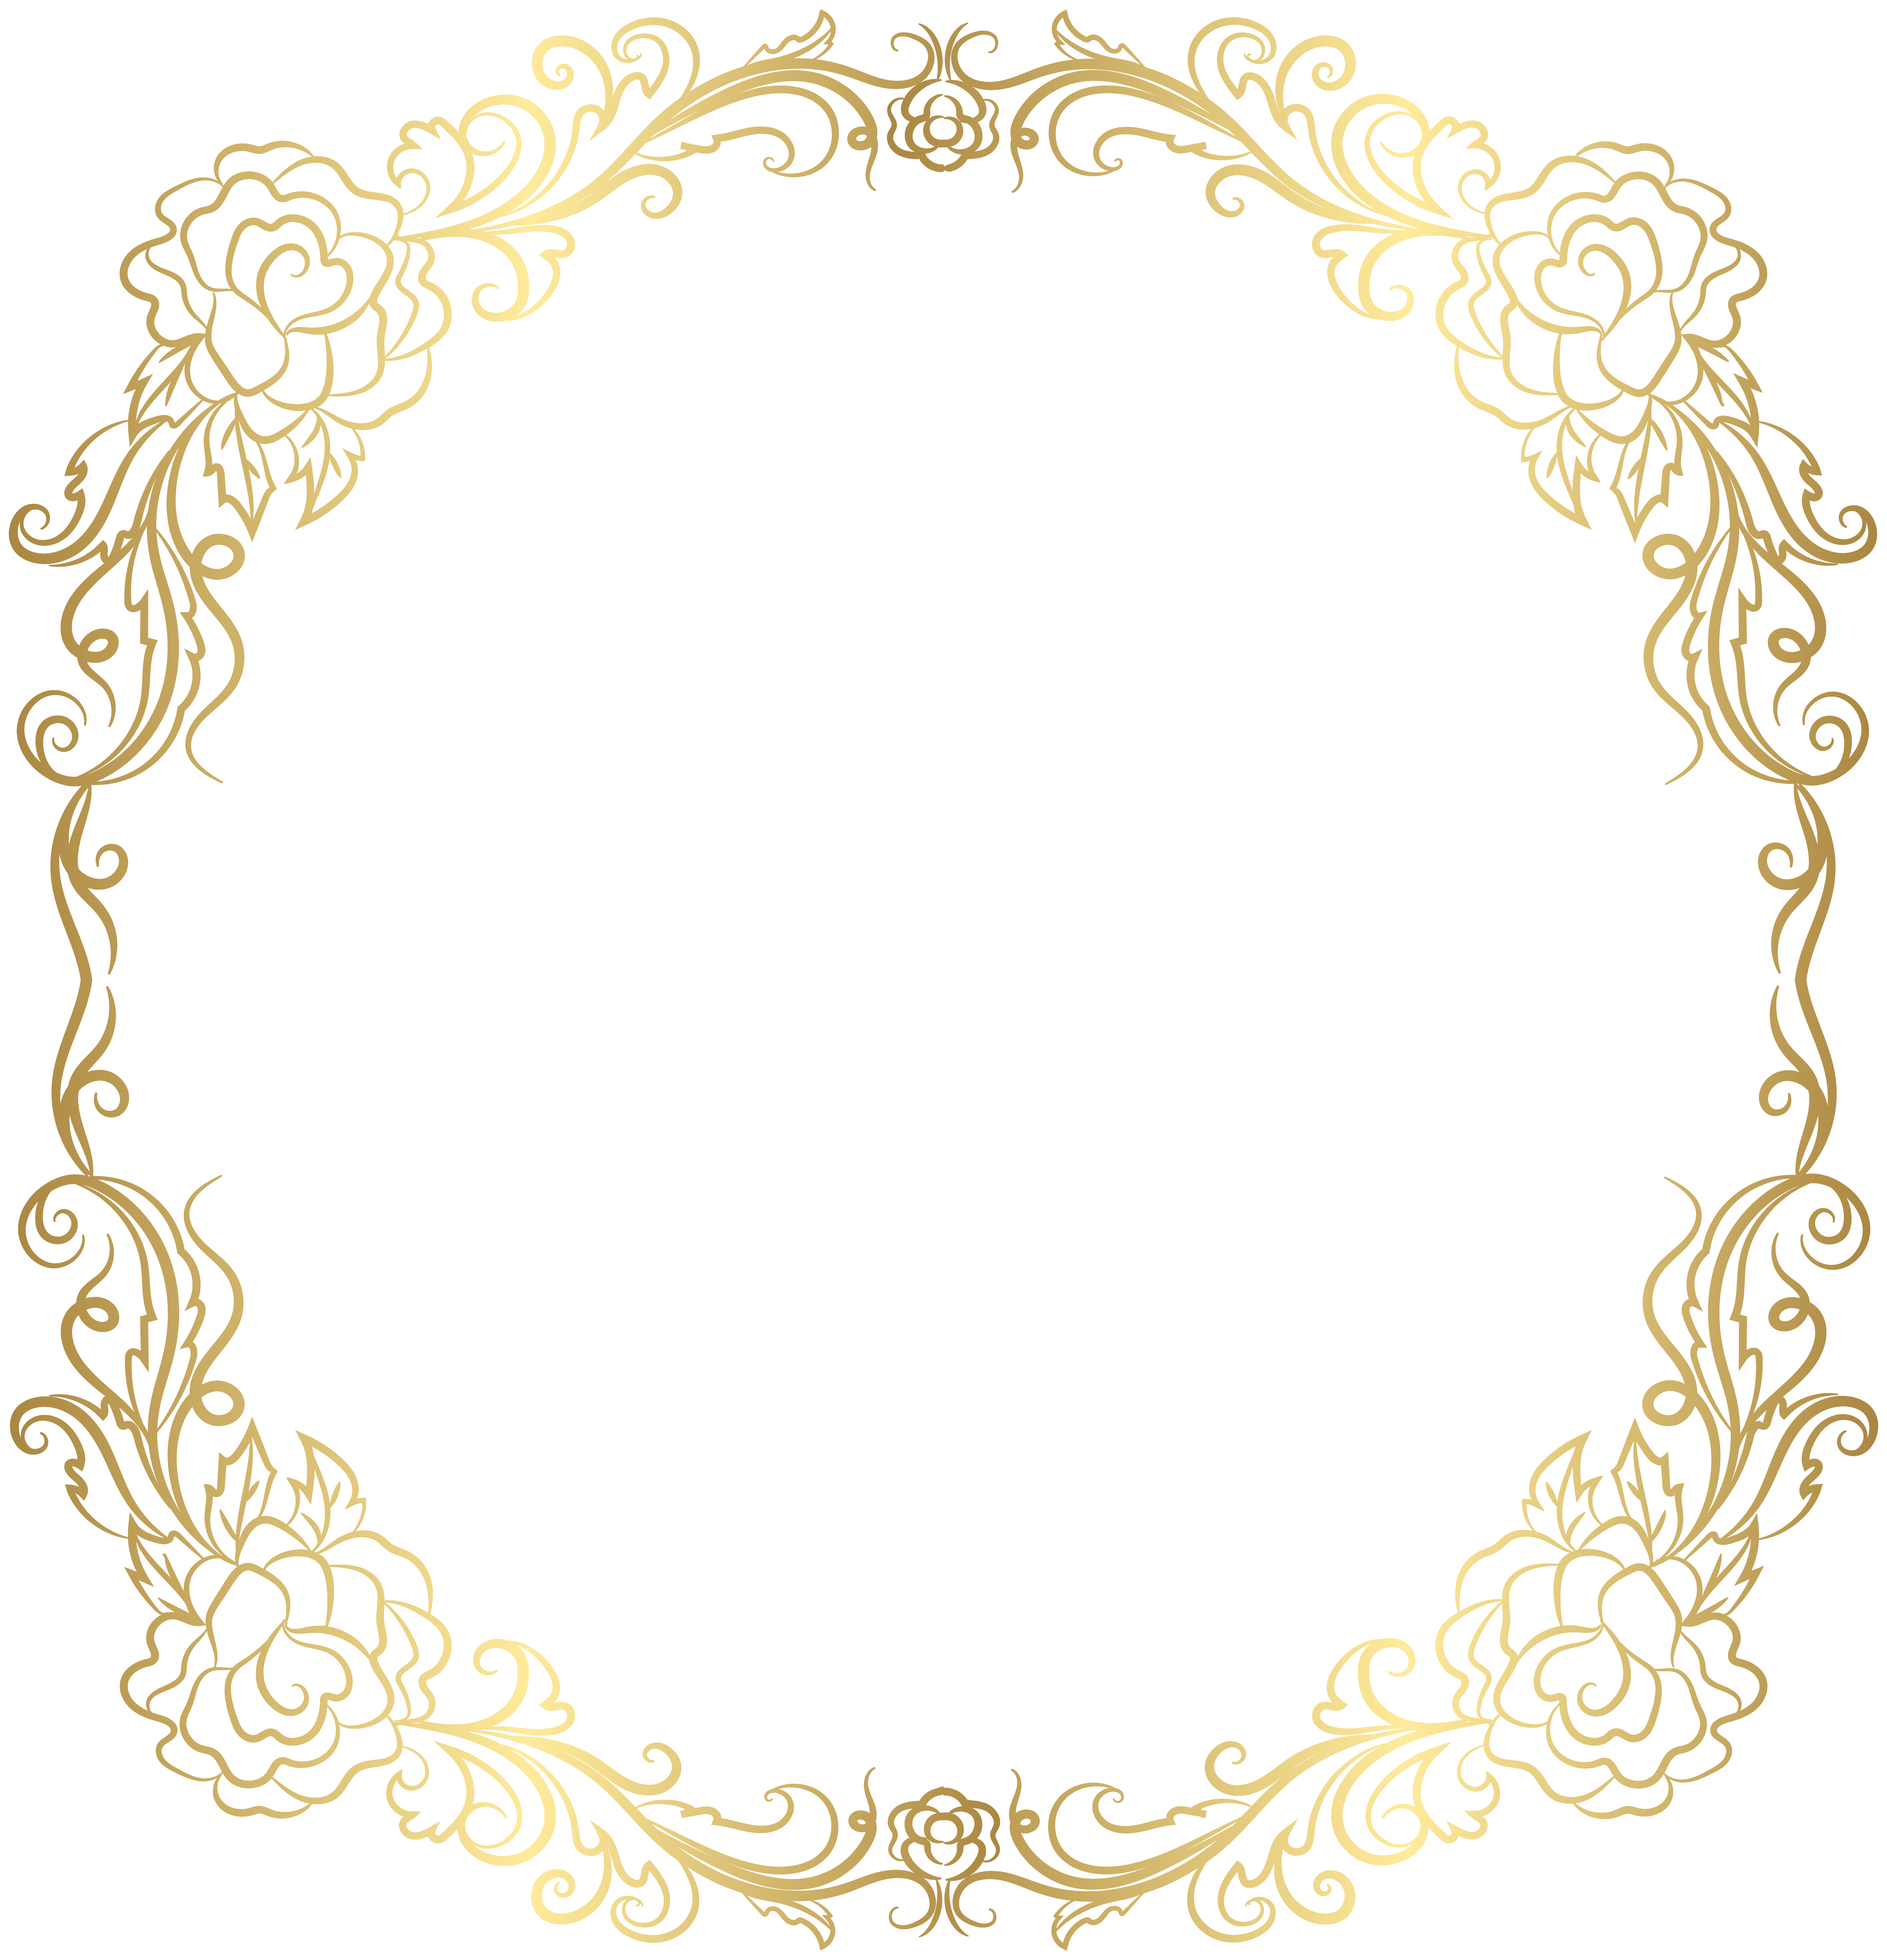 Essay clipart paperwork. Deco golden border frame